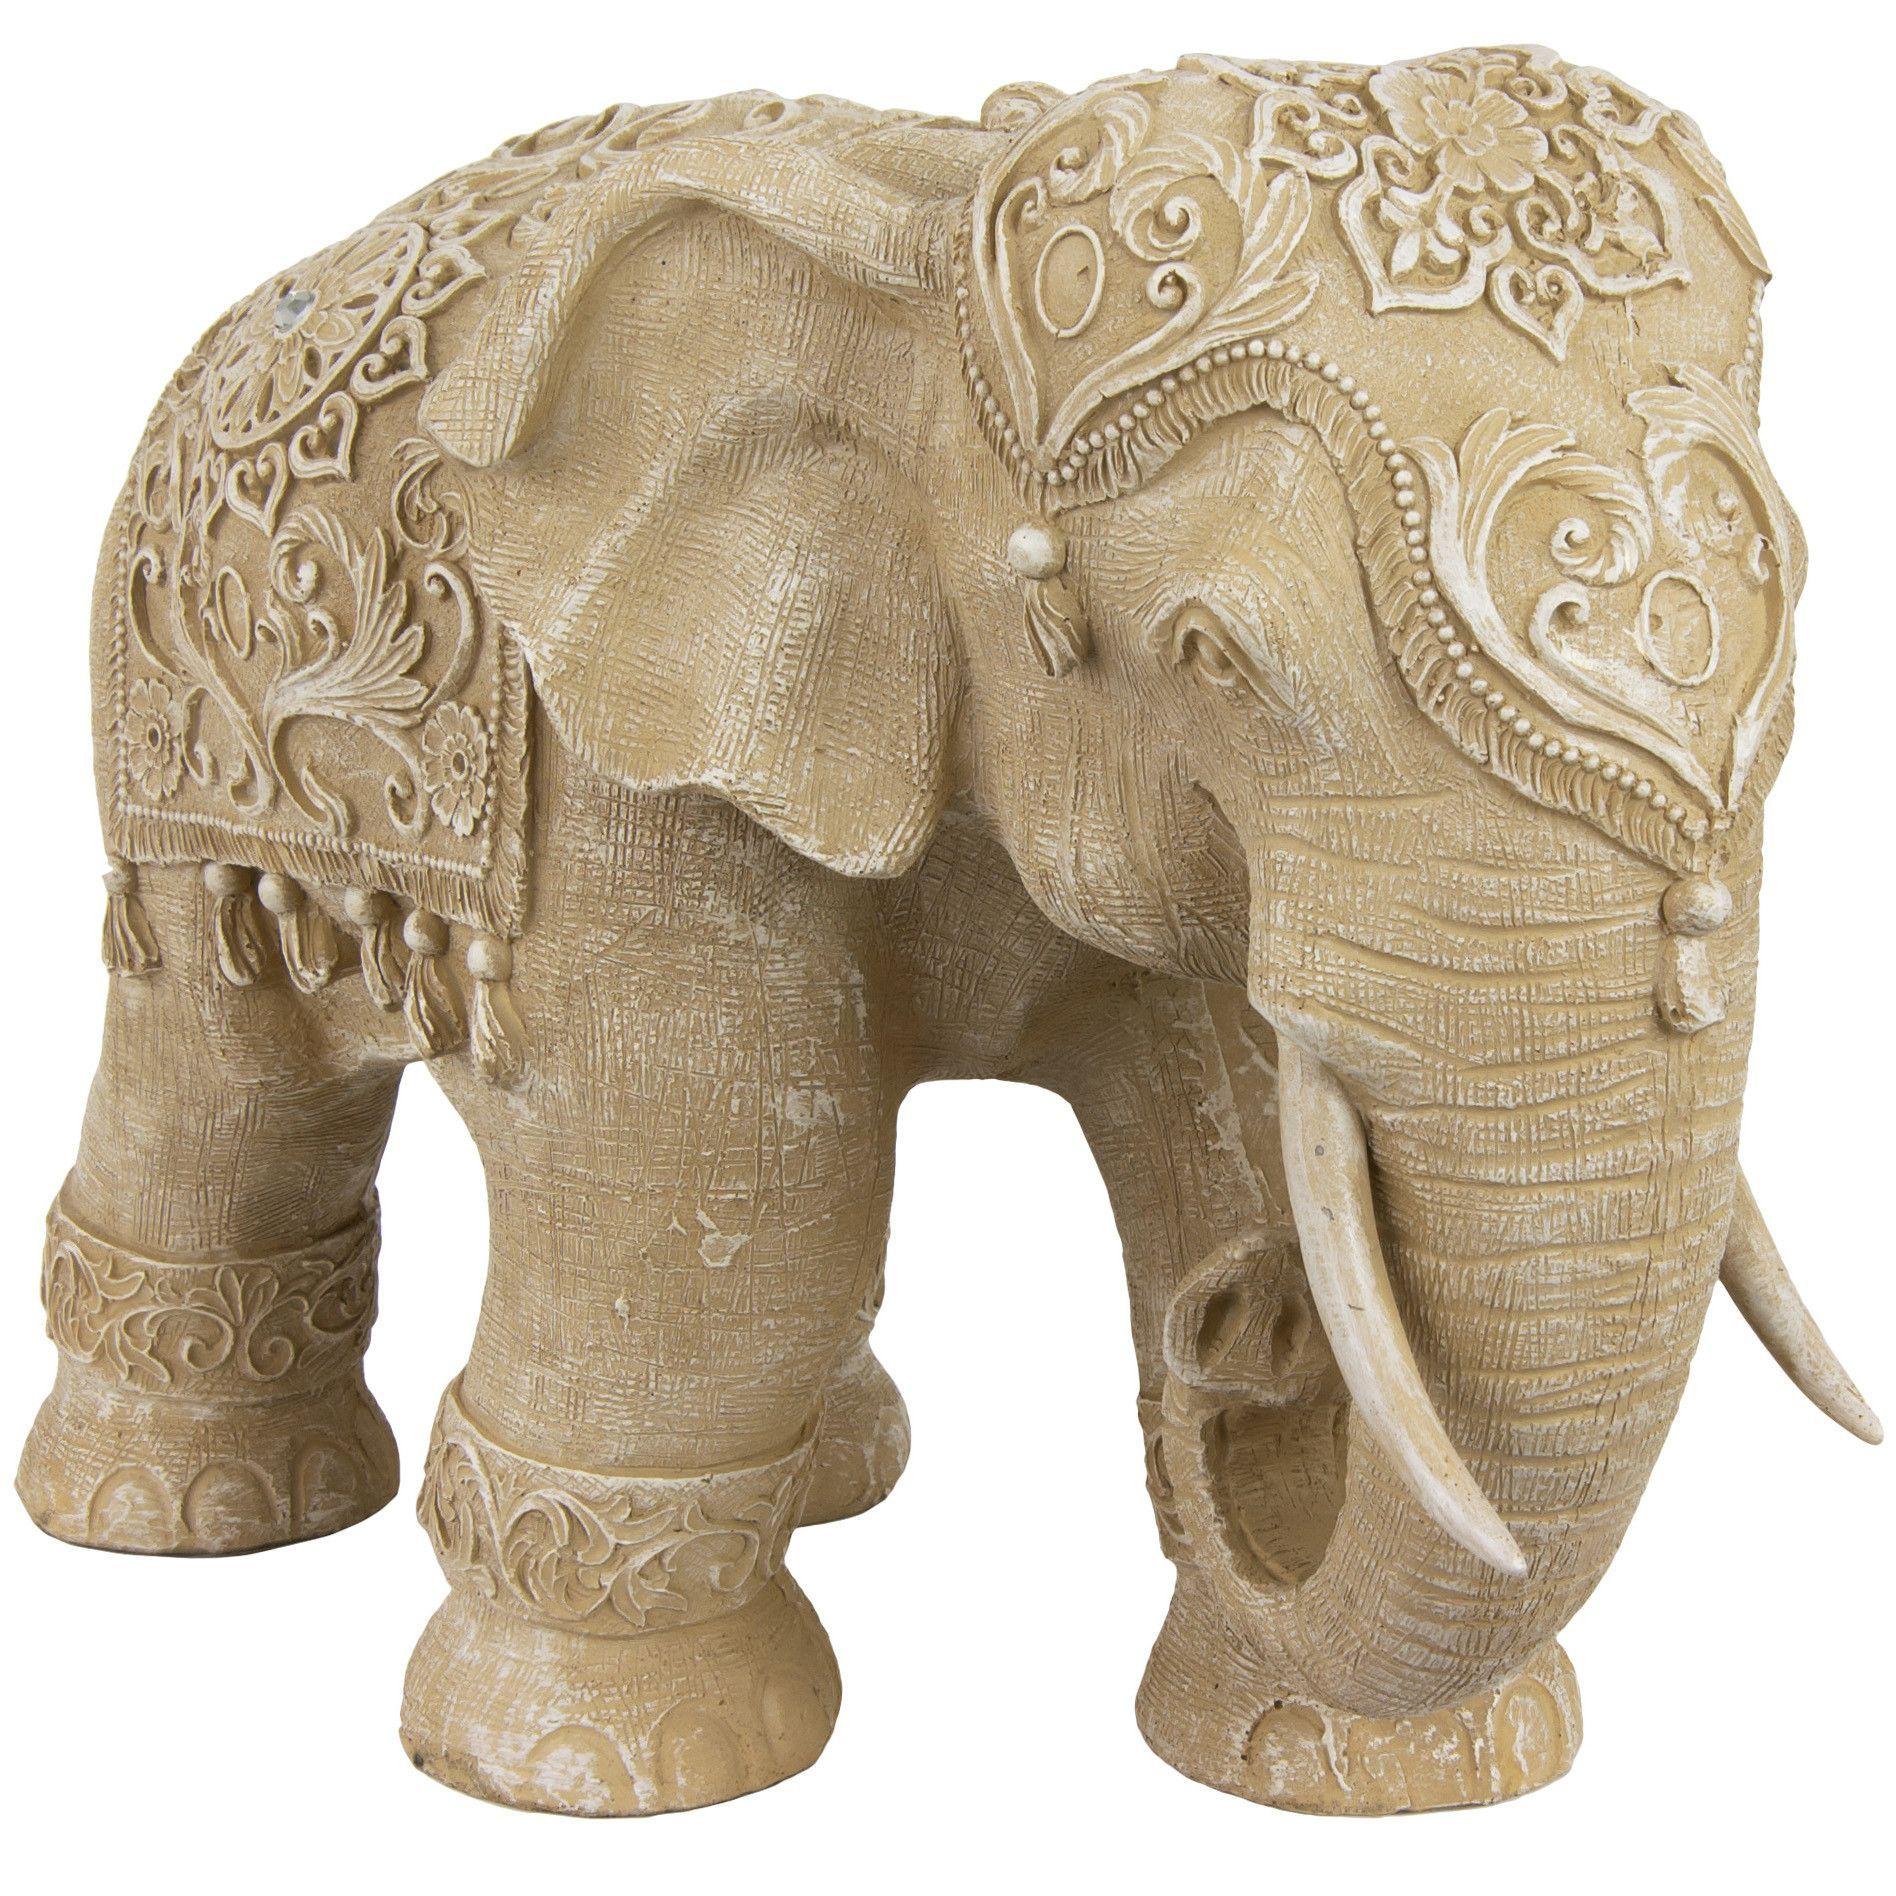 Standing Elephant Figurine Слоны, Скульптуры животных и